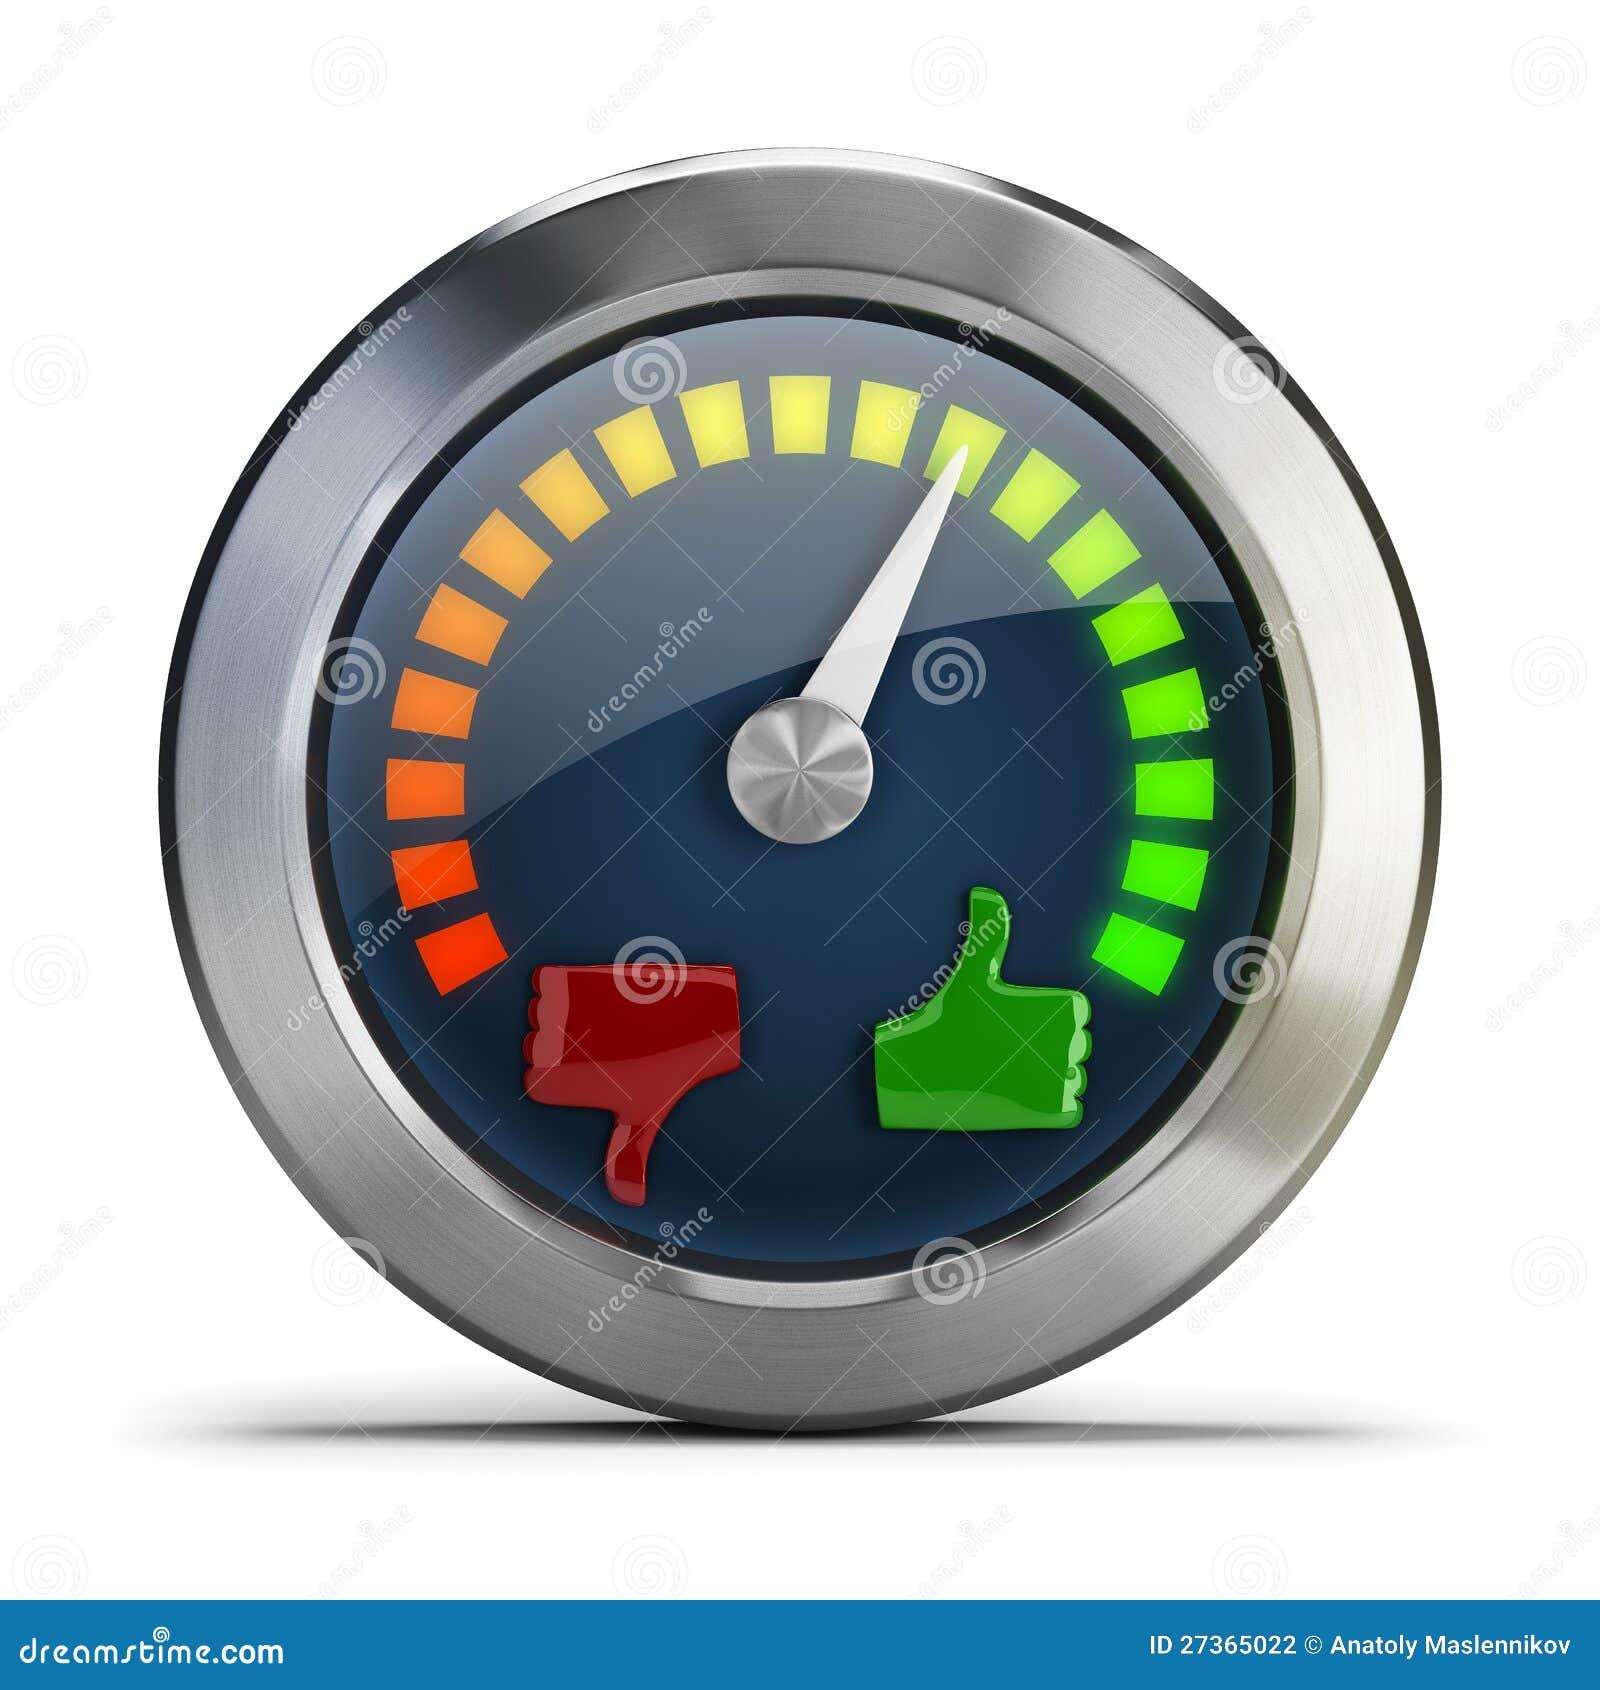 Mood meter stock illustration. Illustration of green ...